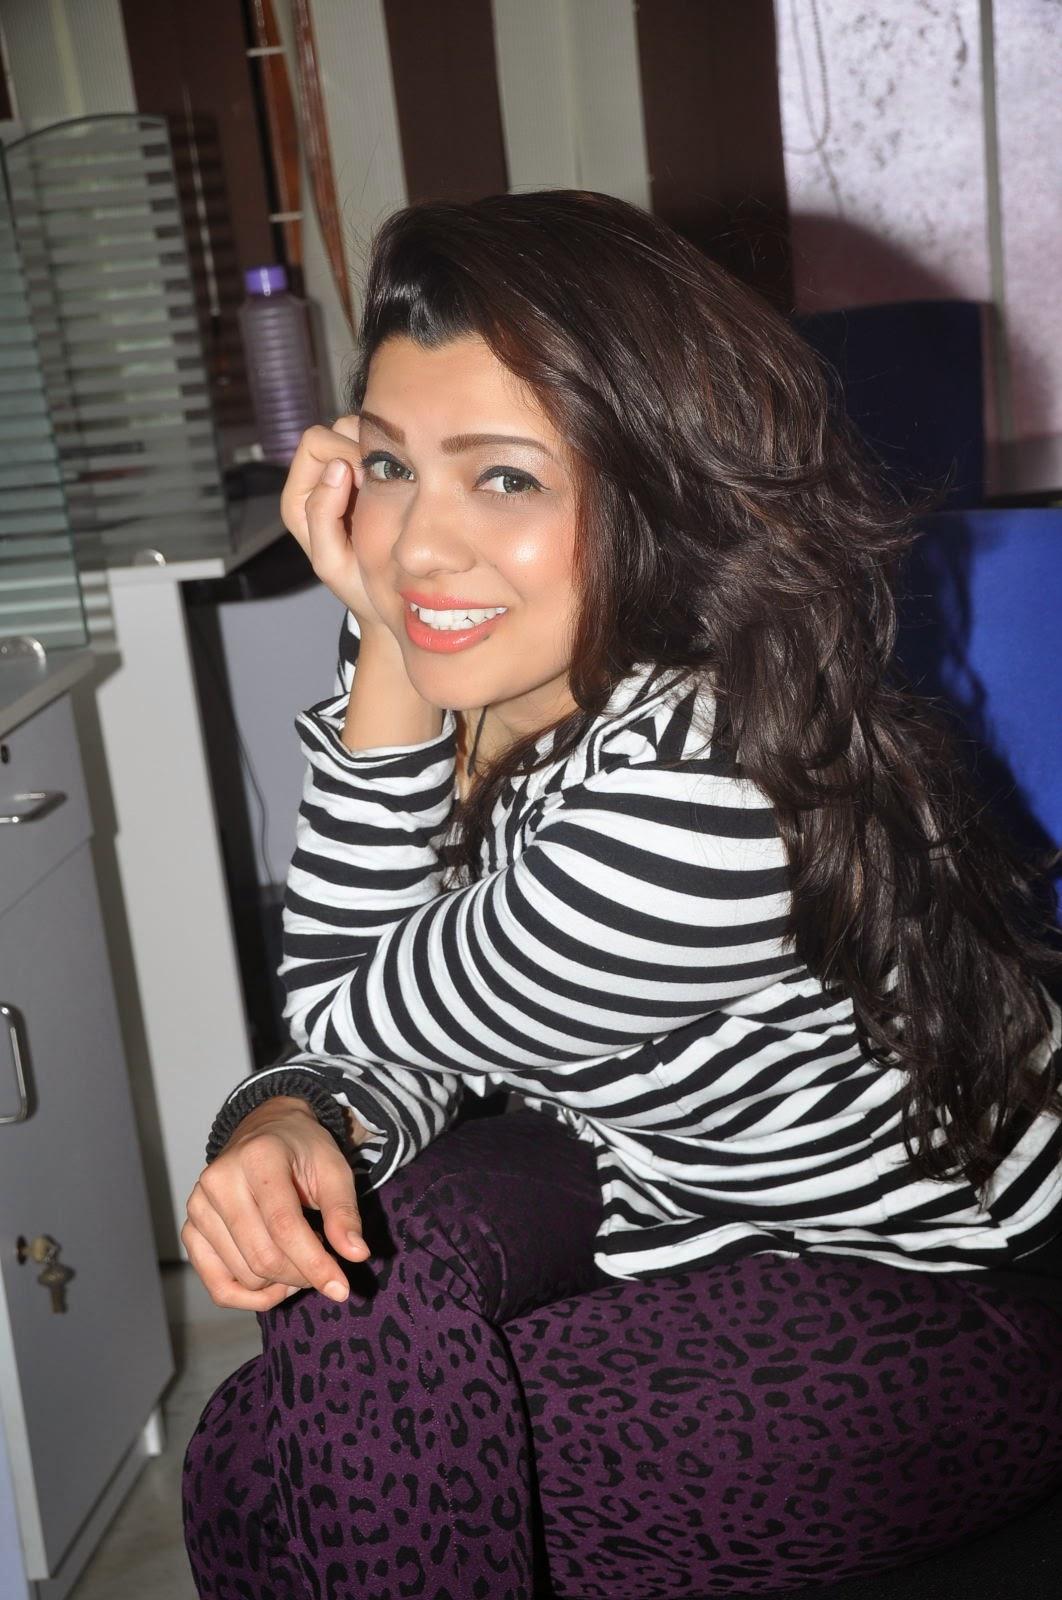 Actress Pari Nidhi Glam photos Gallery-HQ-Photo-5